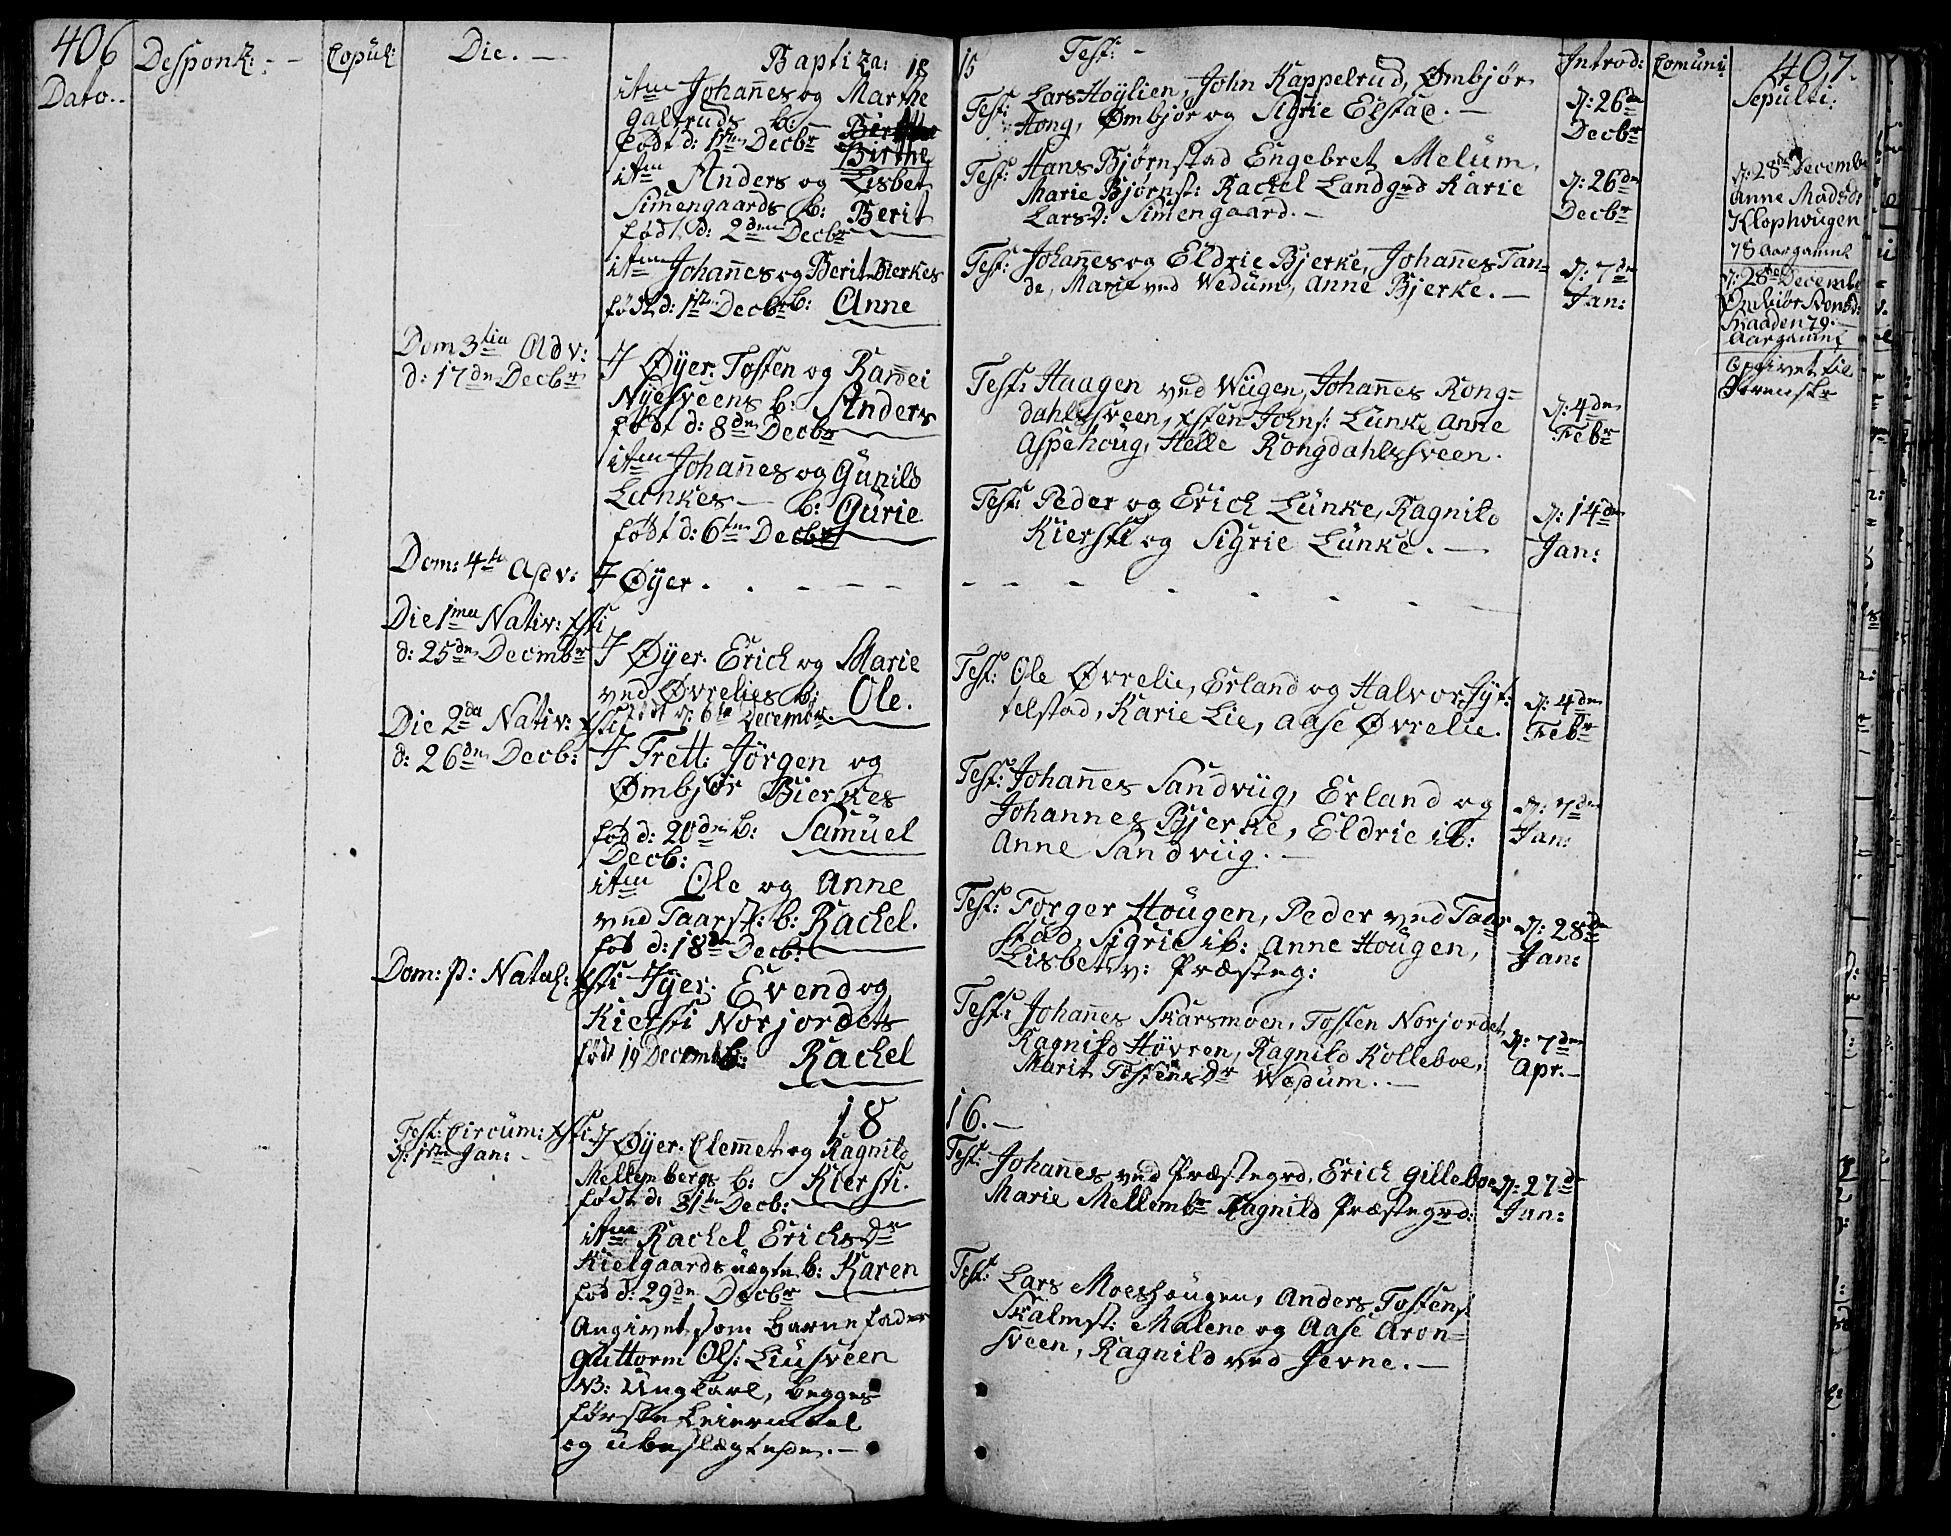 SAH, Øyer prestekontor, Ministerialbok nr. 3, 1784-1824, s. 406-407